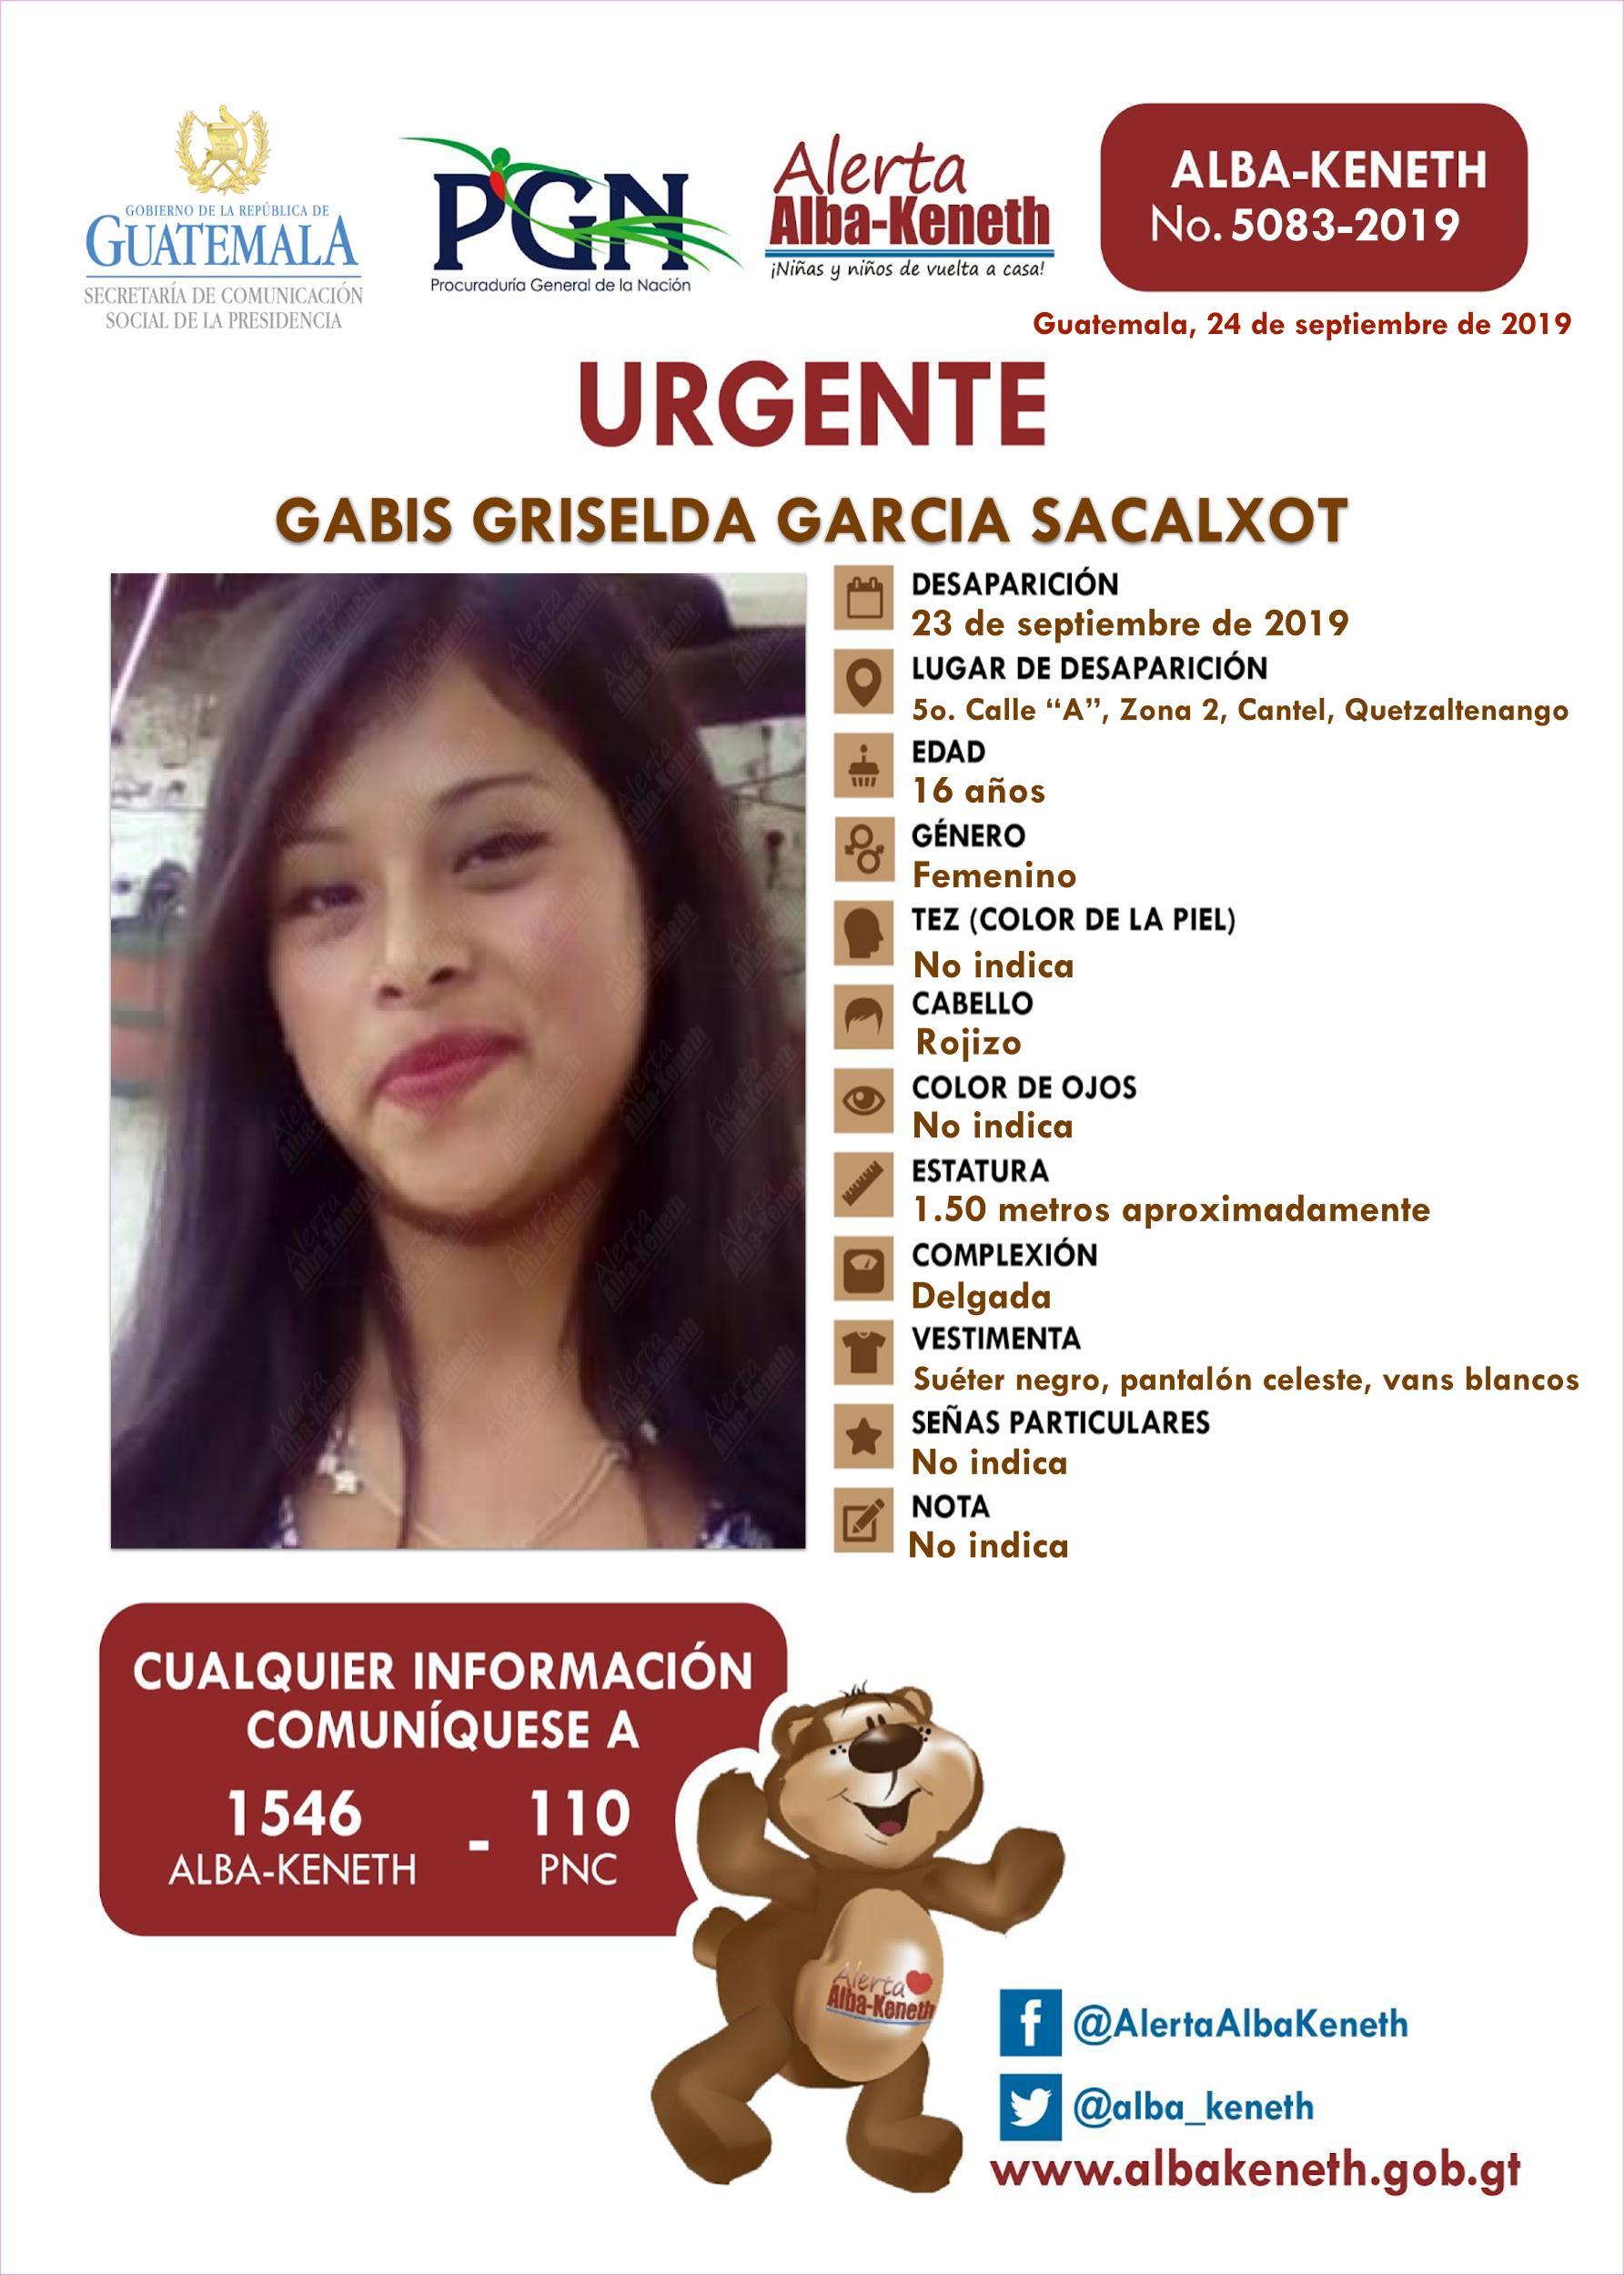 Gabis Griselda Garcia Sacalxot